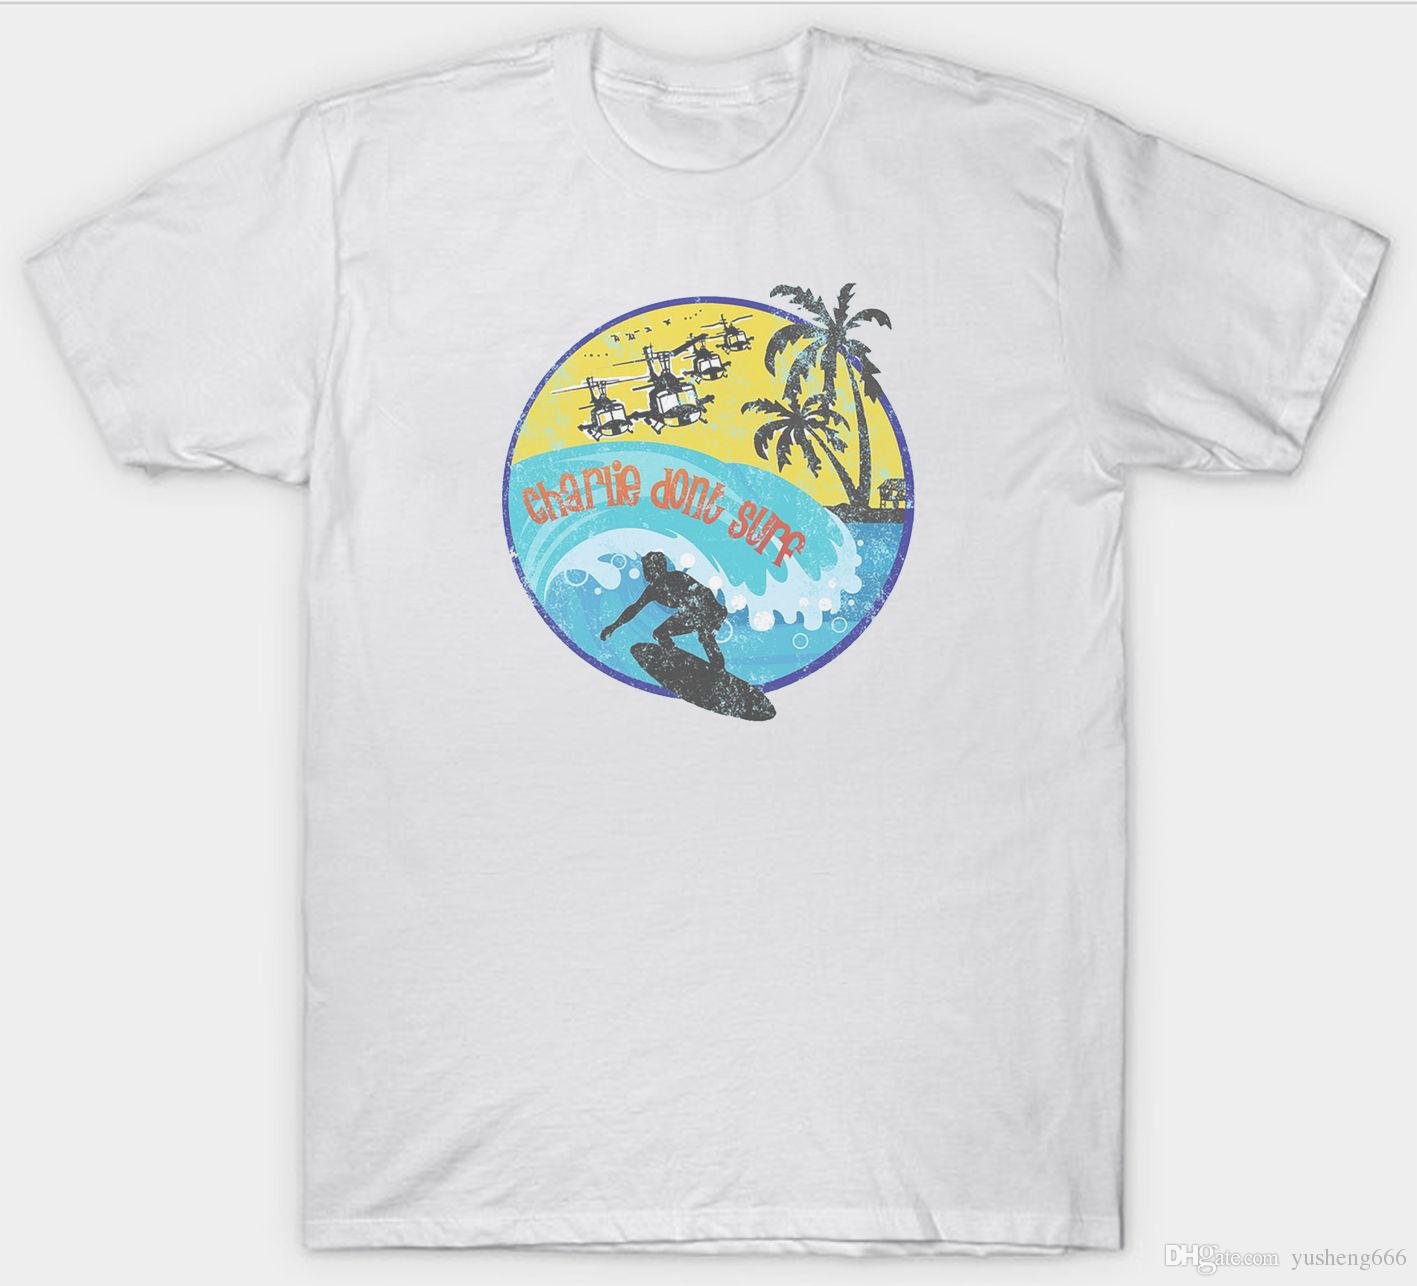 Charlie dont surfer t shirt apocalypse now film movie 1980s birthday present newest 2017 fashion printed mens men t shirt 2018 new short sleeve t shirt